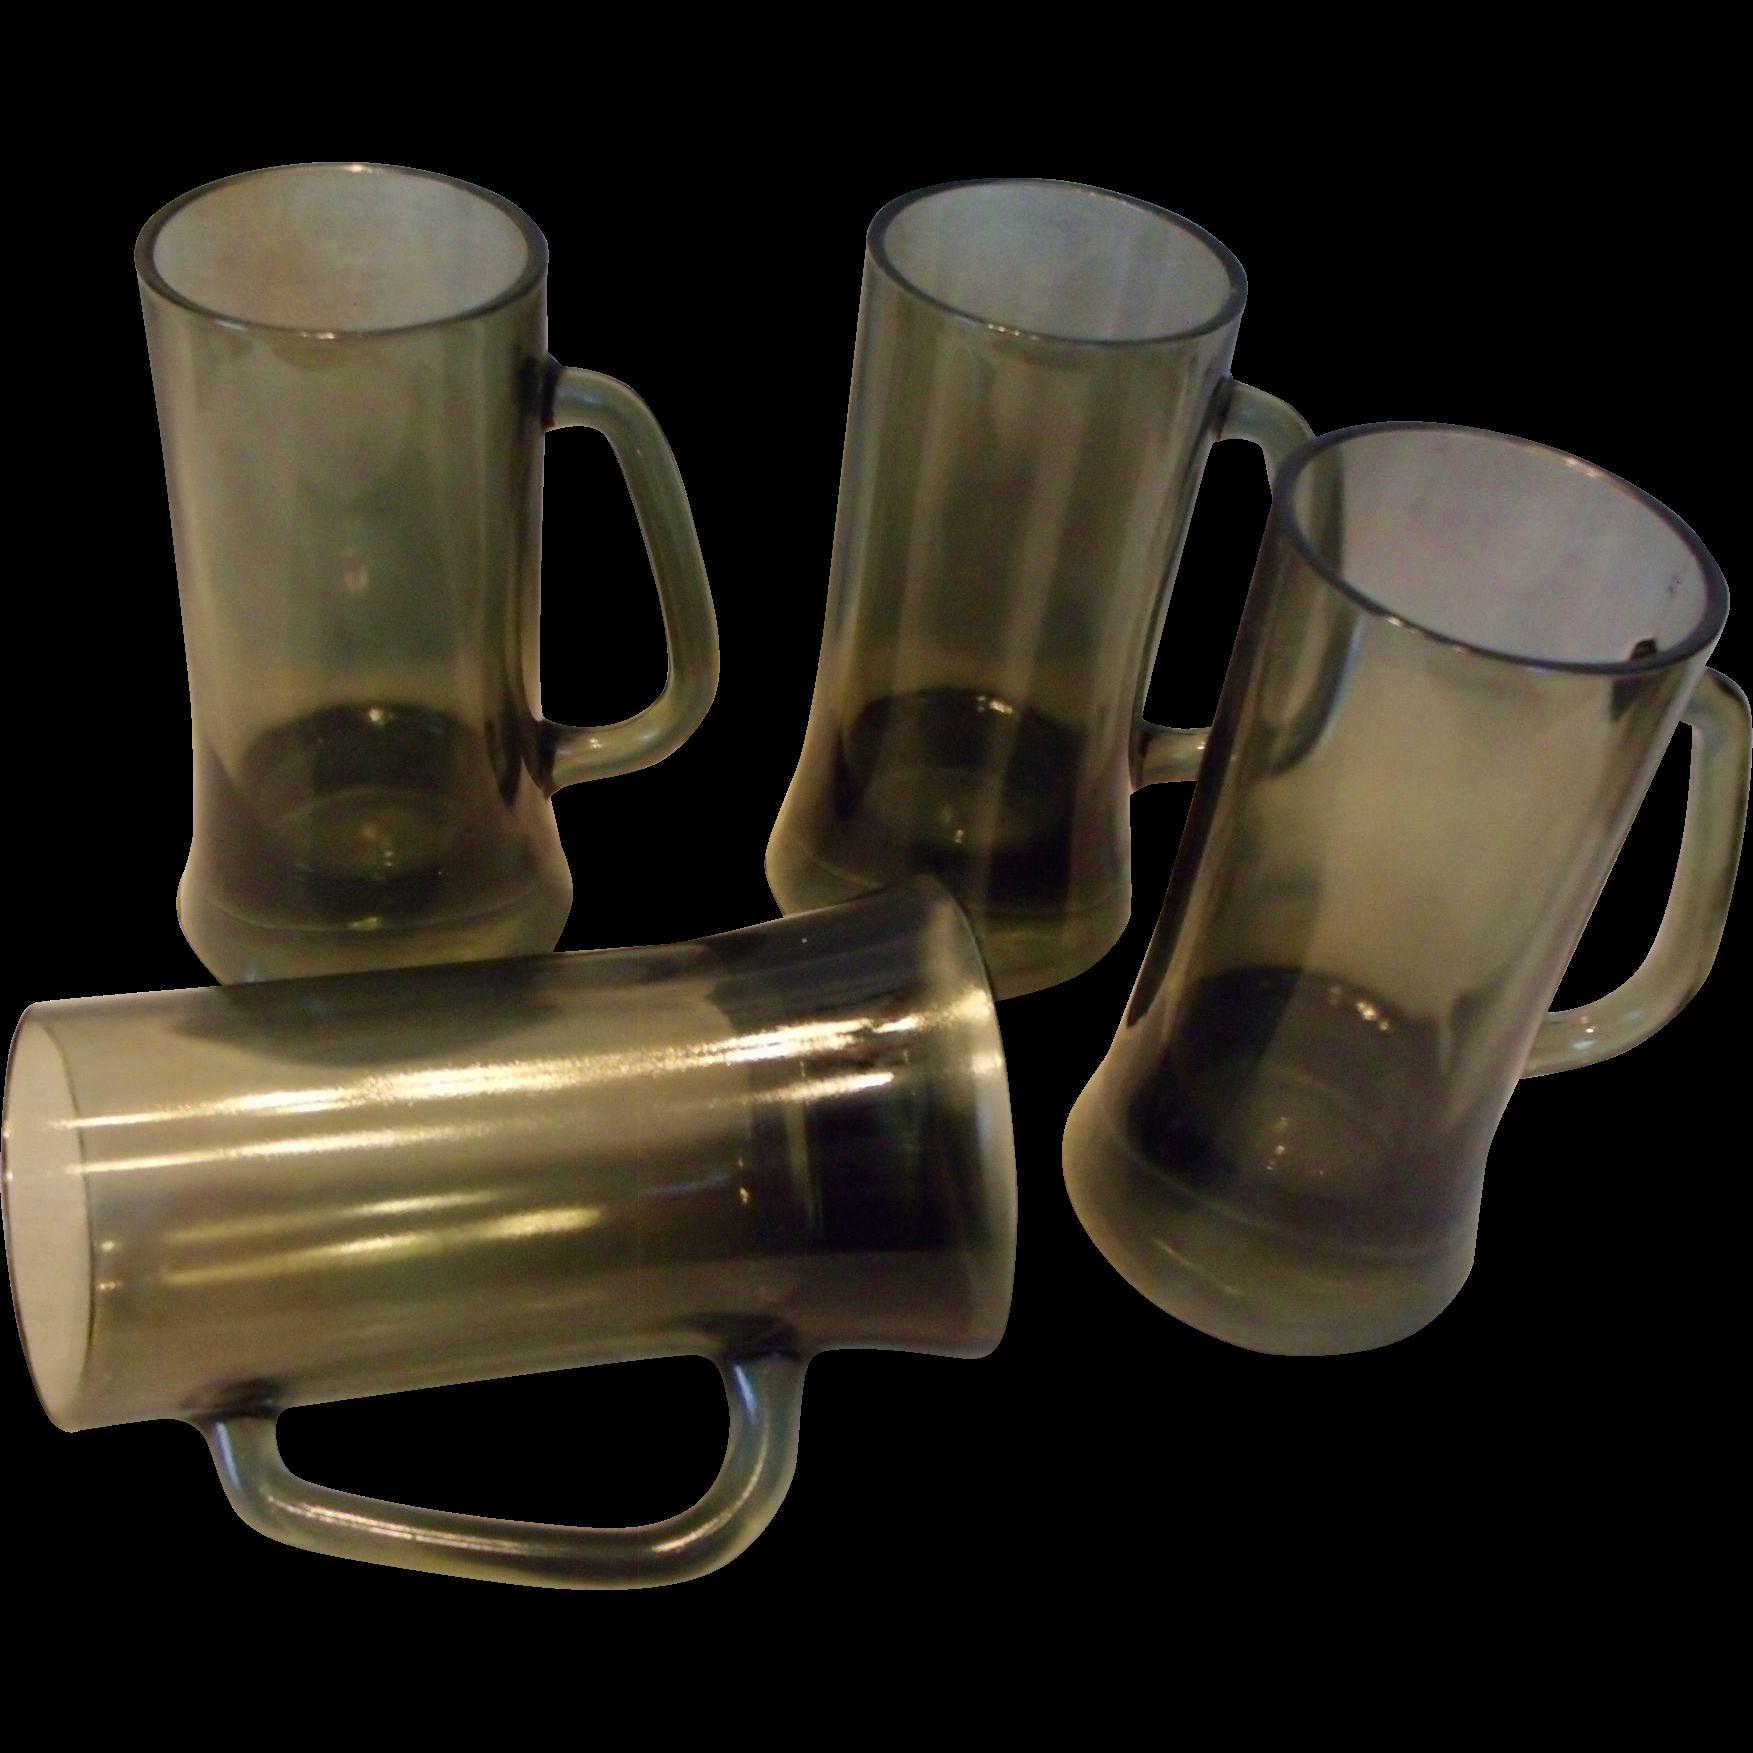 Set Of 4 Smoke Glass Mugs Beer Steins Mid-Century